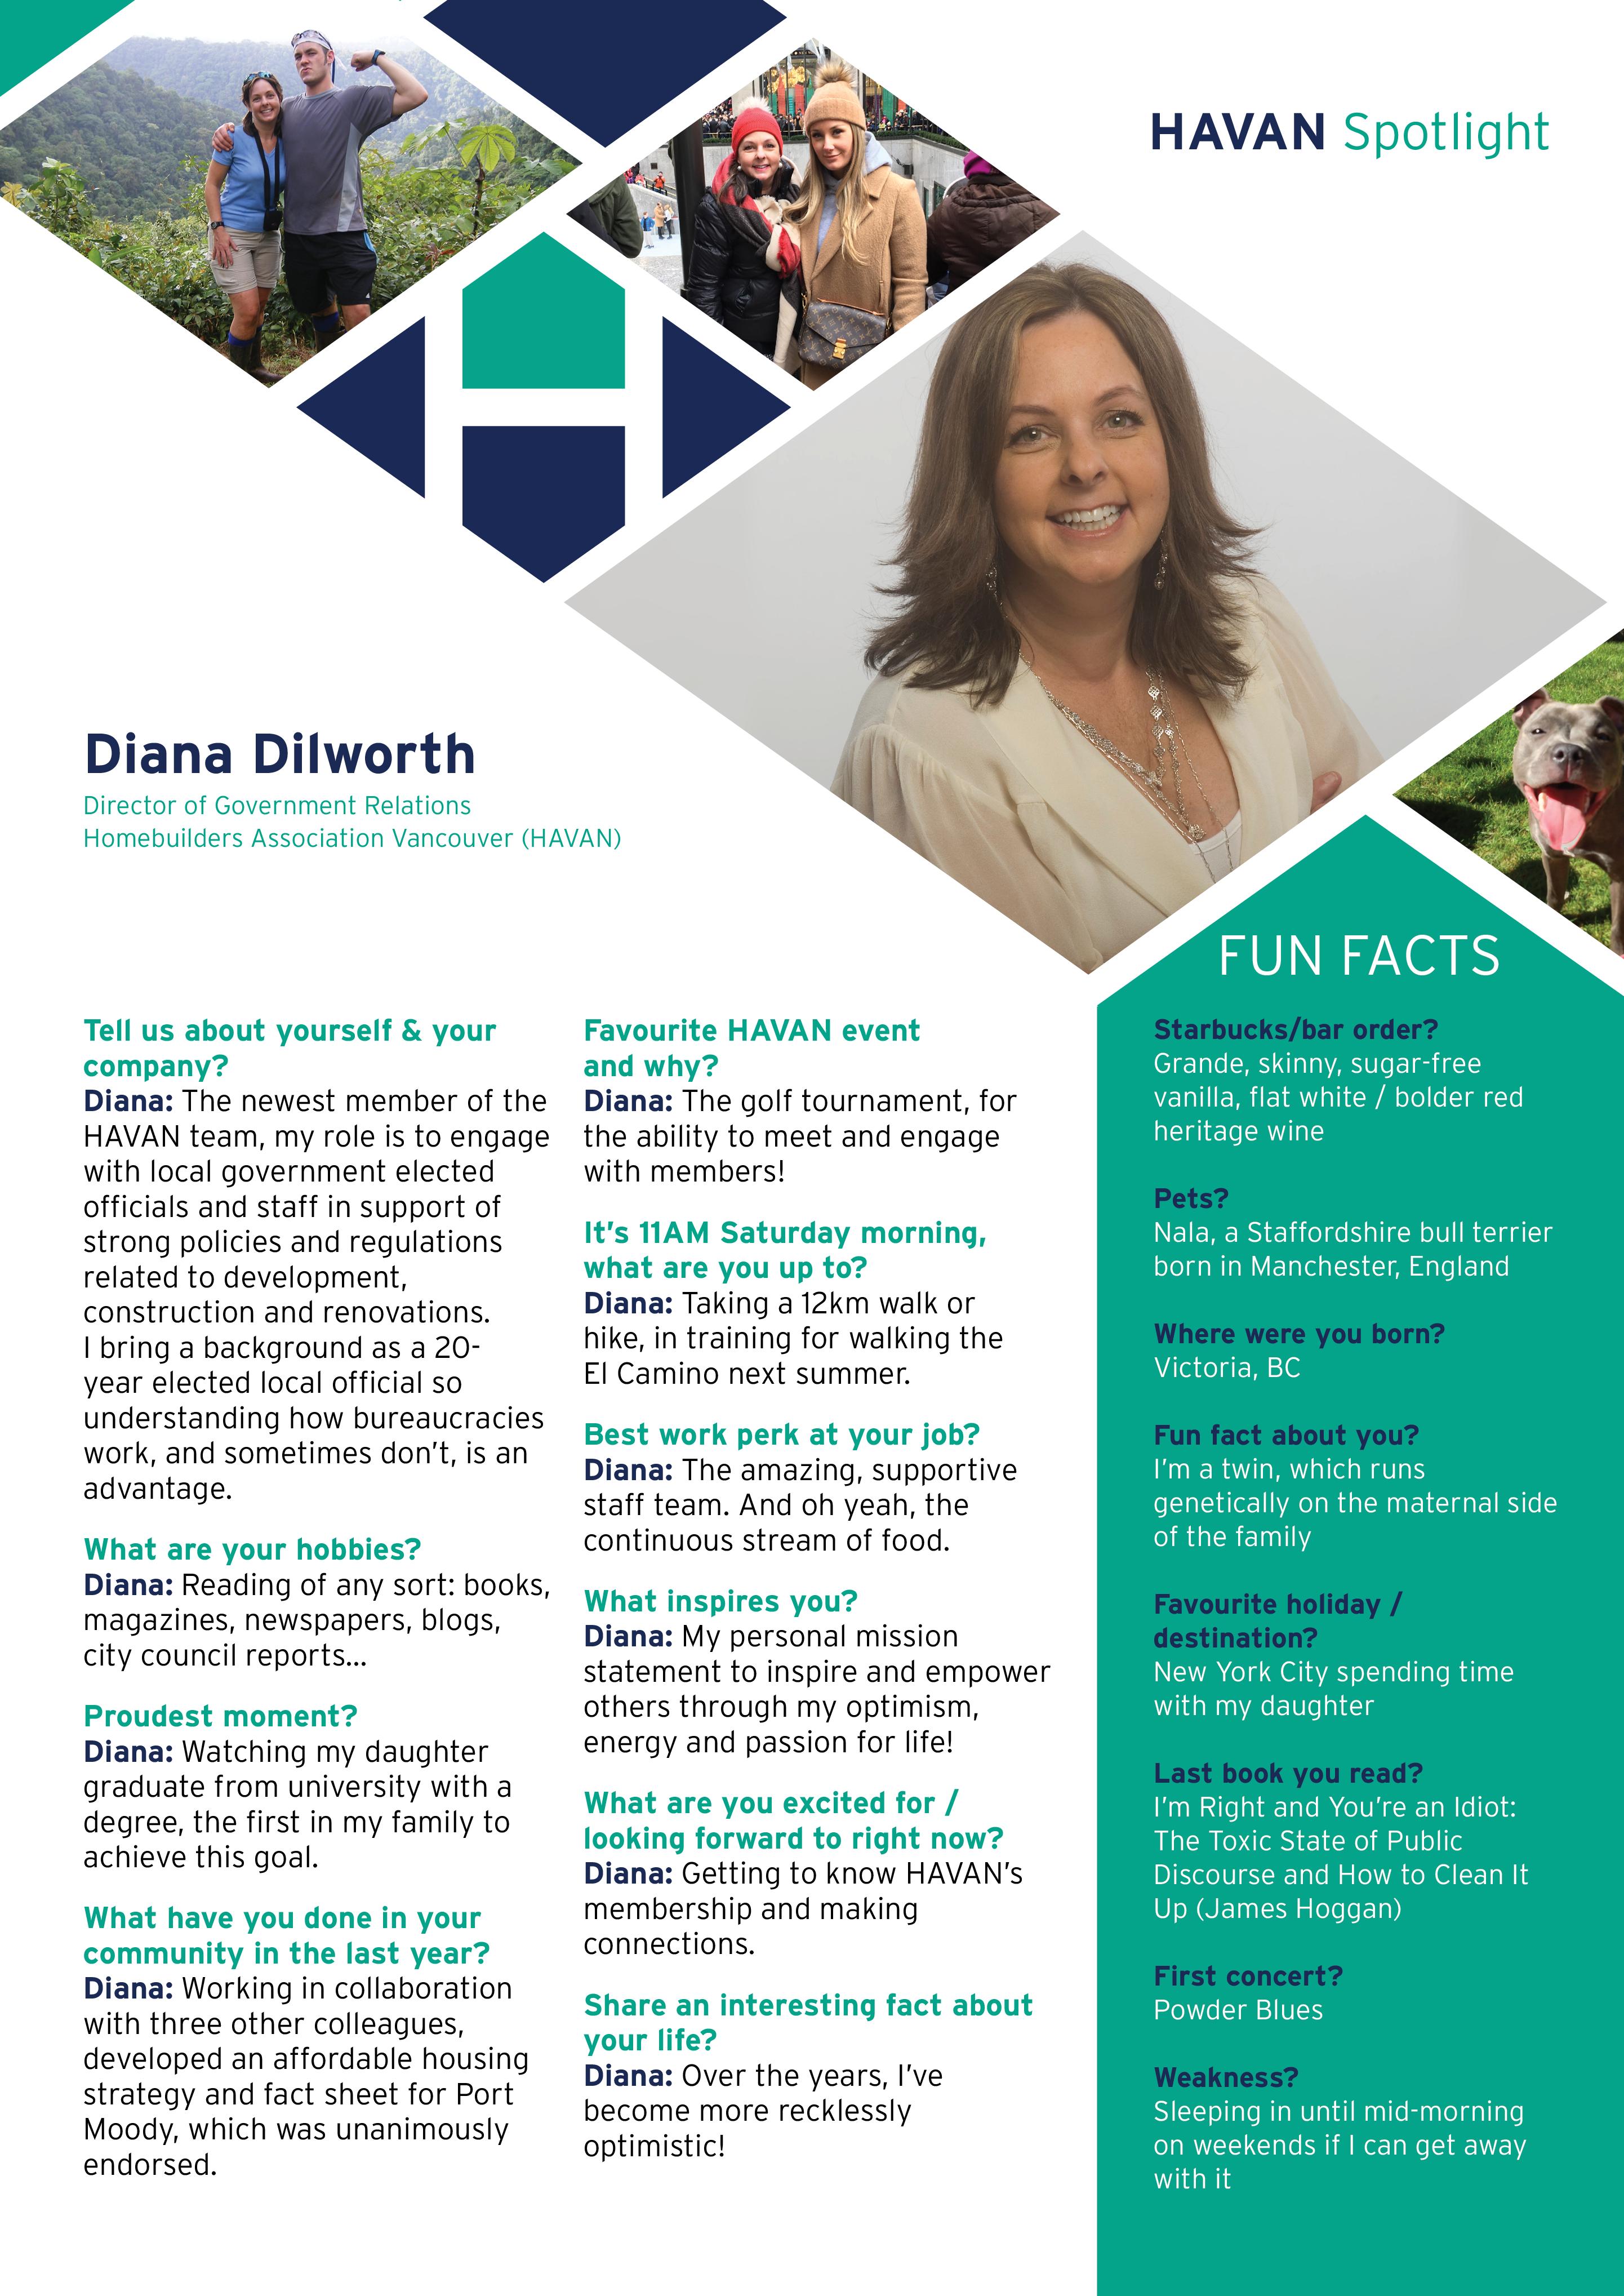 Diana Dilworth